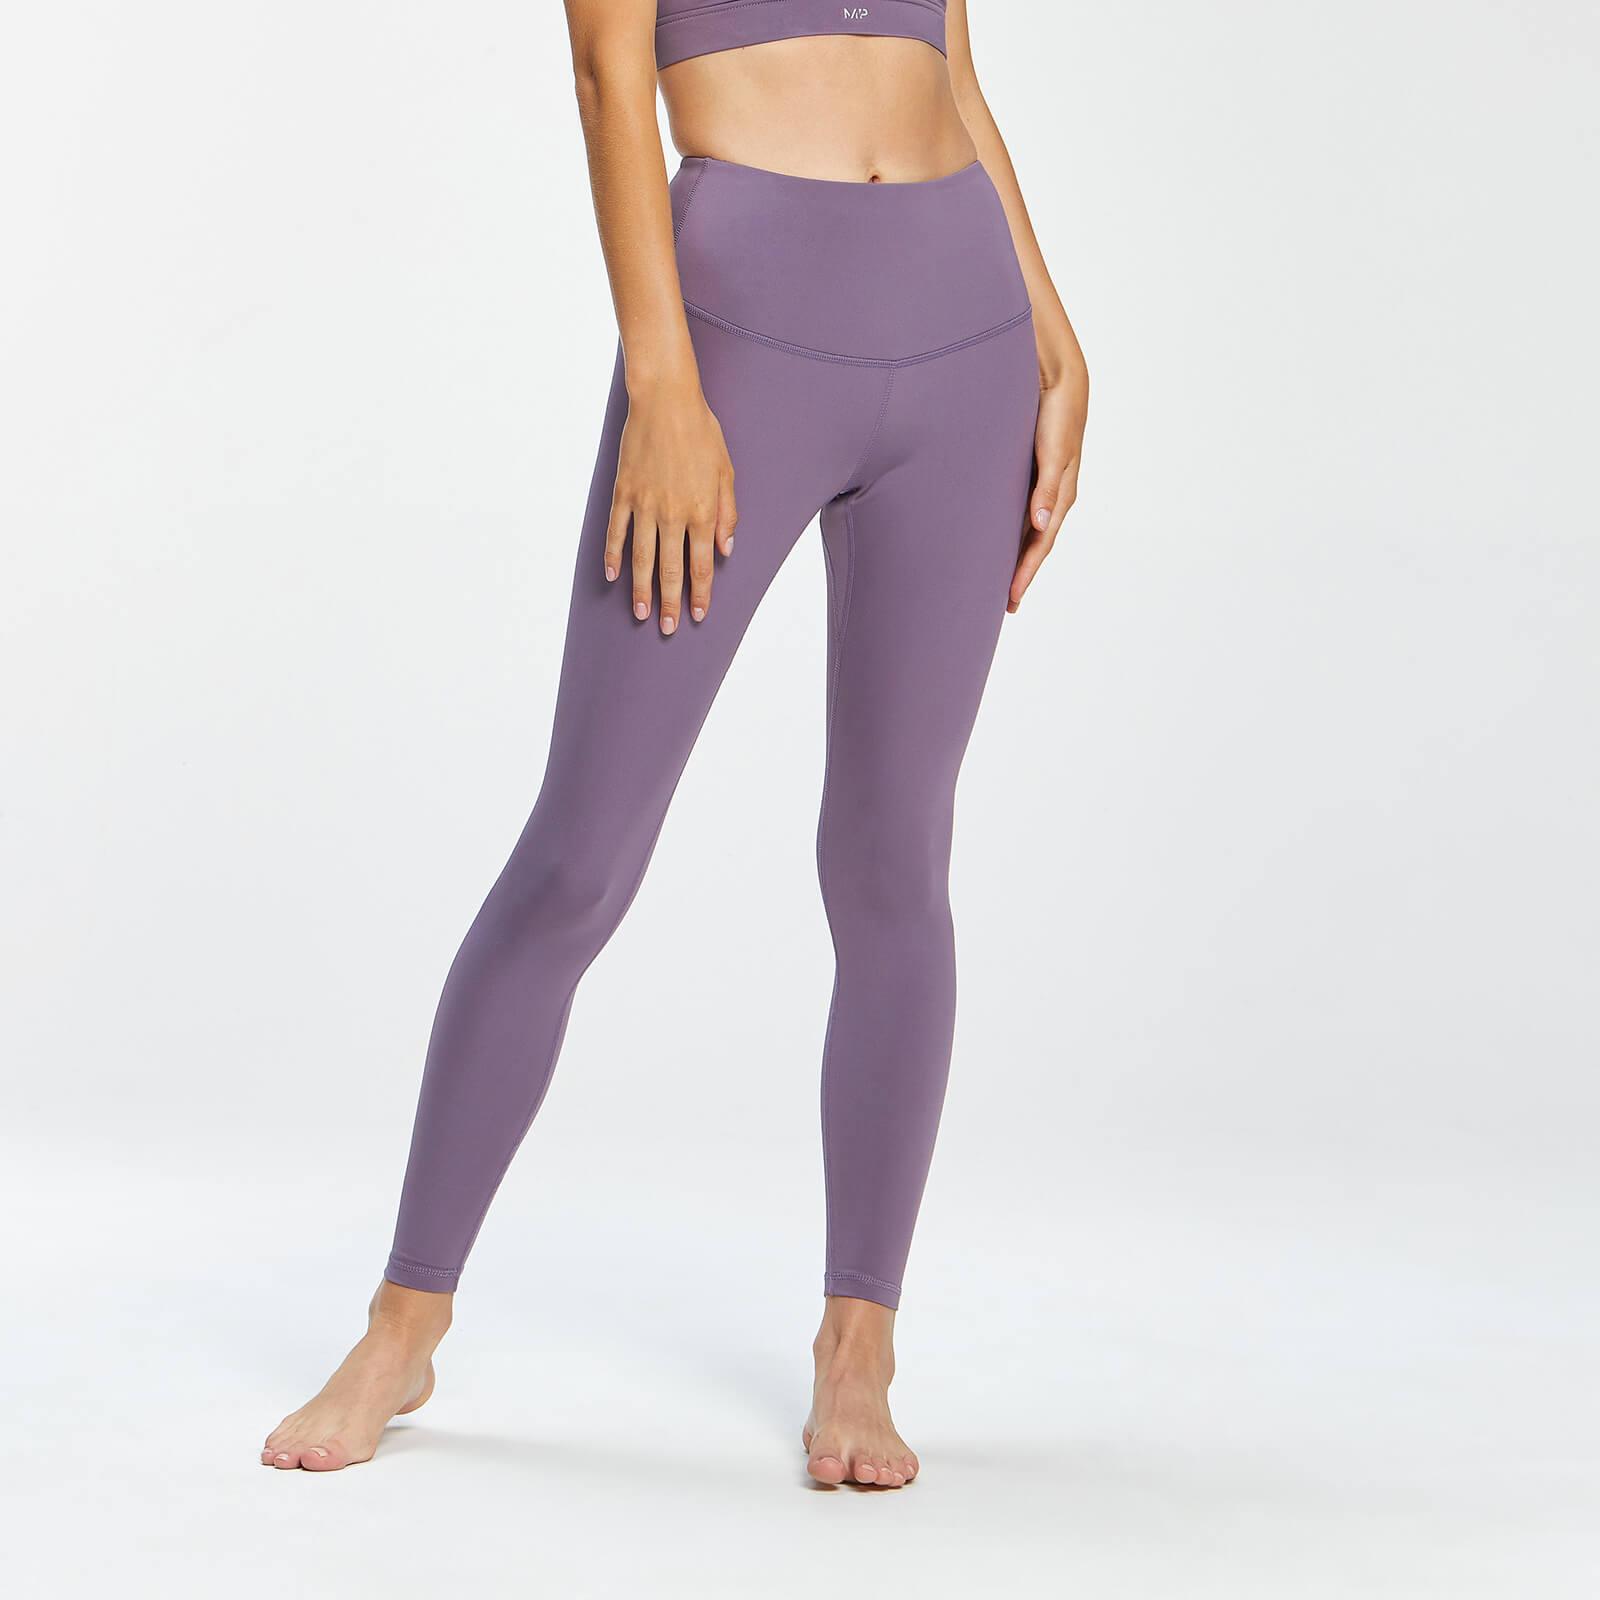 MP Women's Composure Stirrup Leggings - Smokey Purple - XXS, Myprotein International  - купить со скидкой